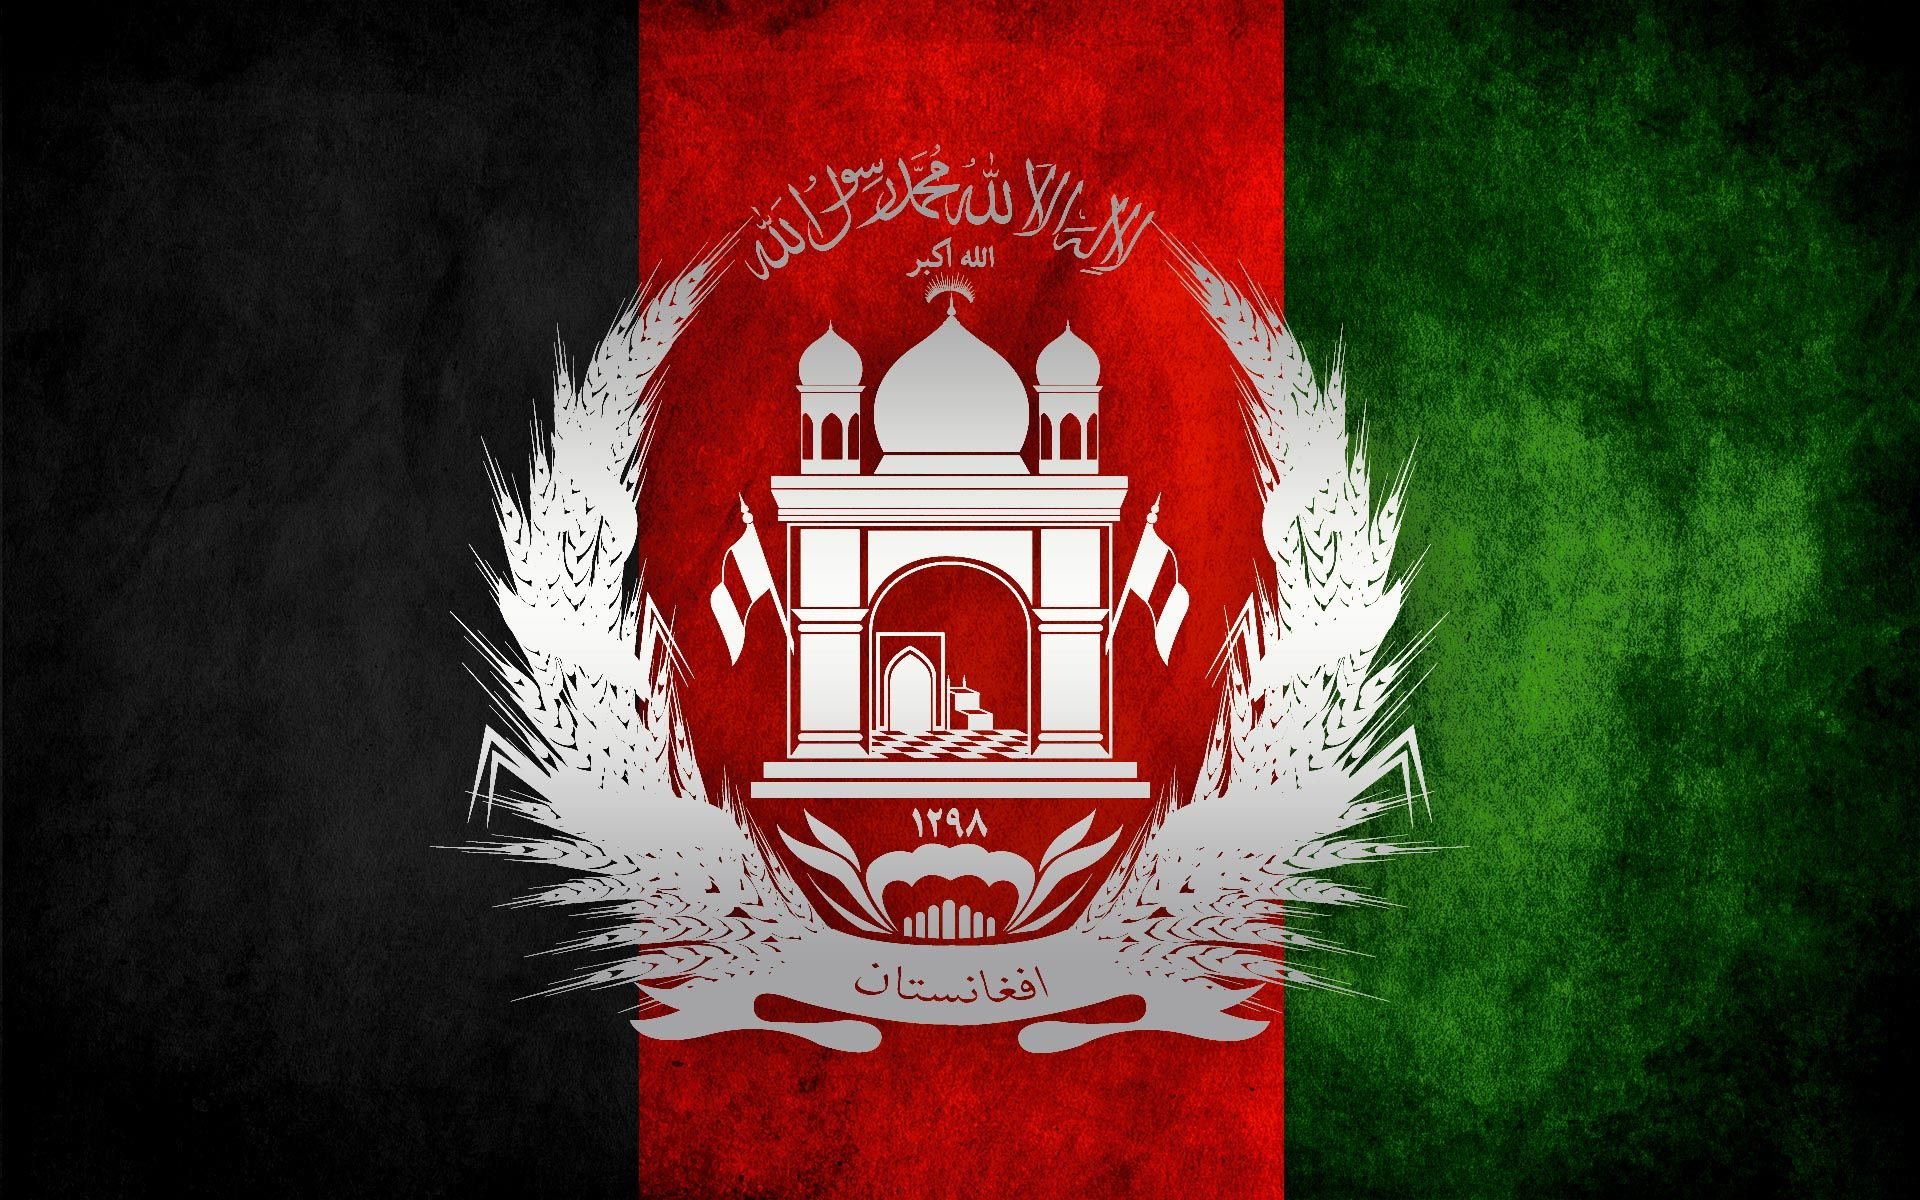 afghanistan wallpaper wallpapersafari afghanistan